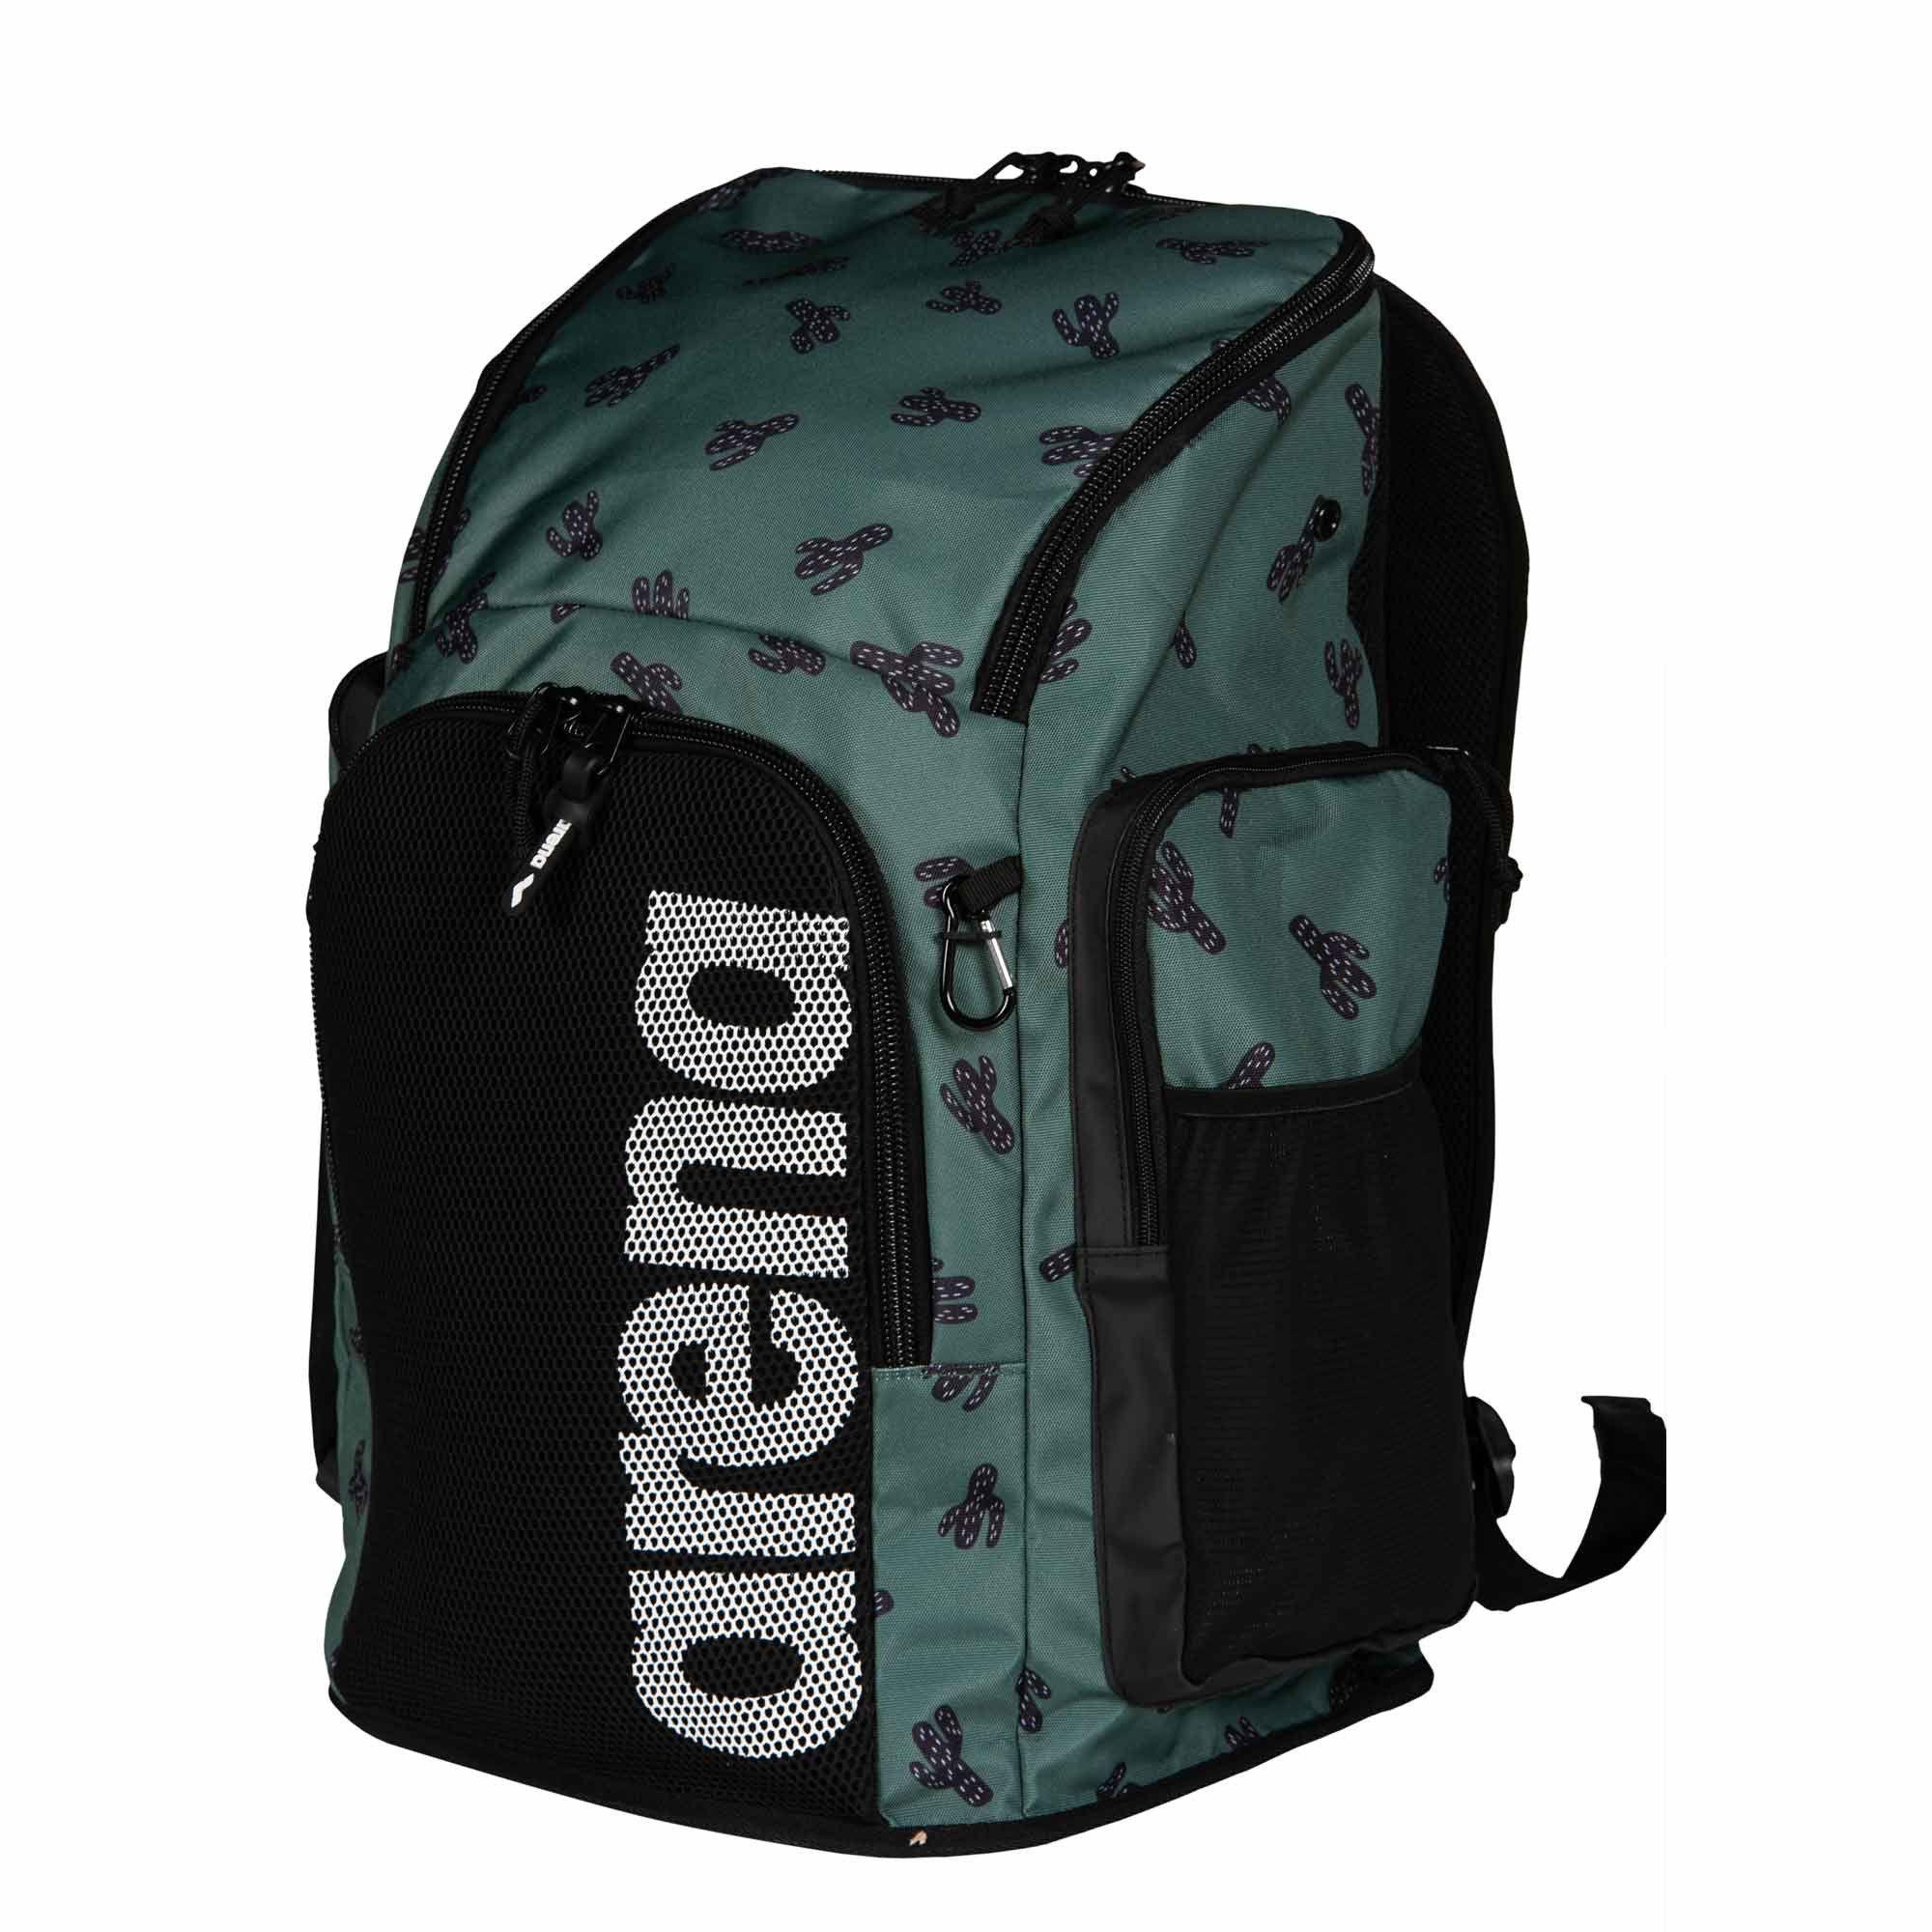 Team Backpack 45 Allover   Backpacks, Bags, Swimming